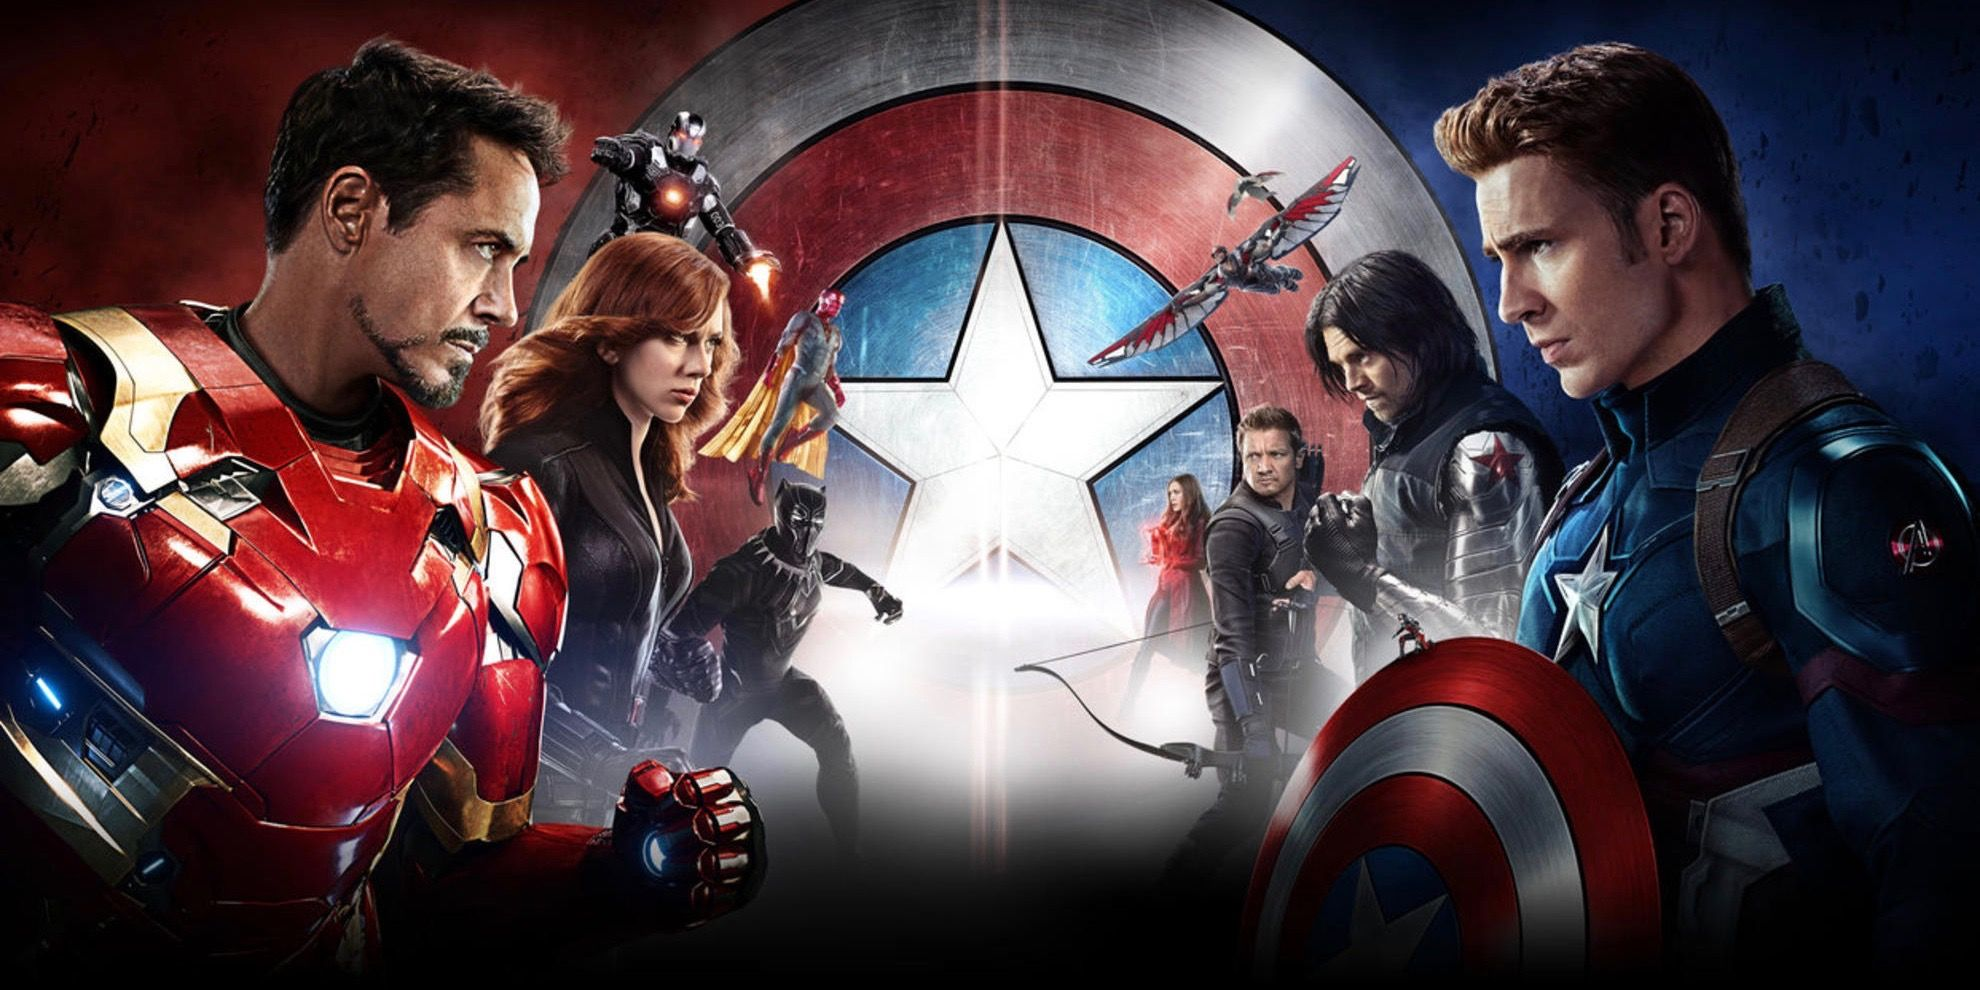 20 Things About Captain America: Civil War That Make No Sense